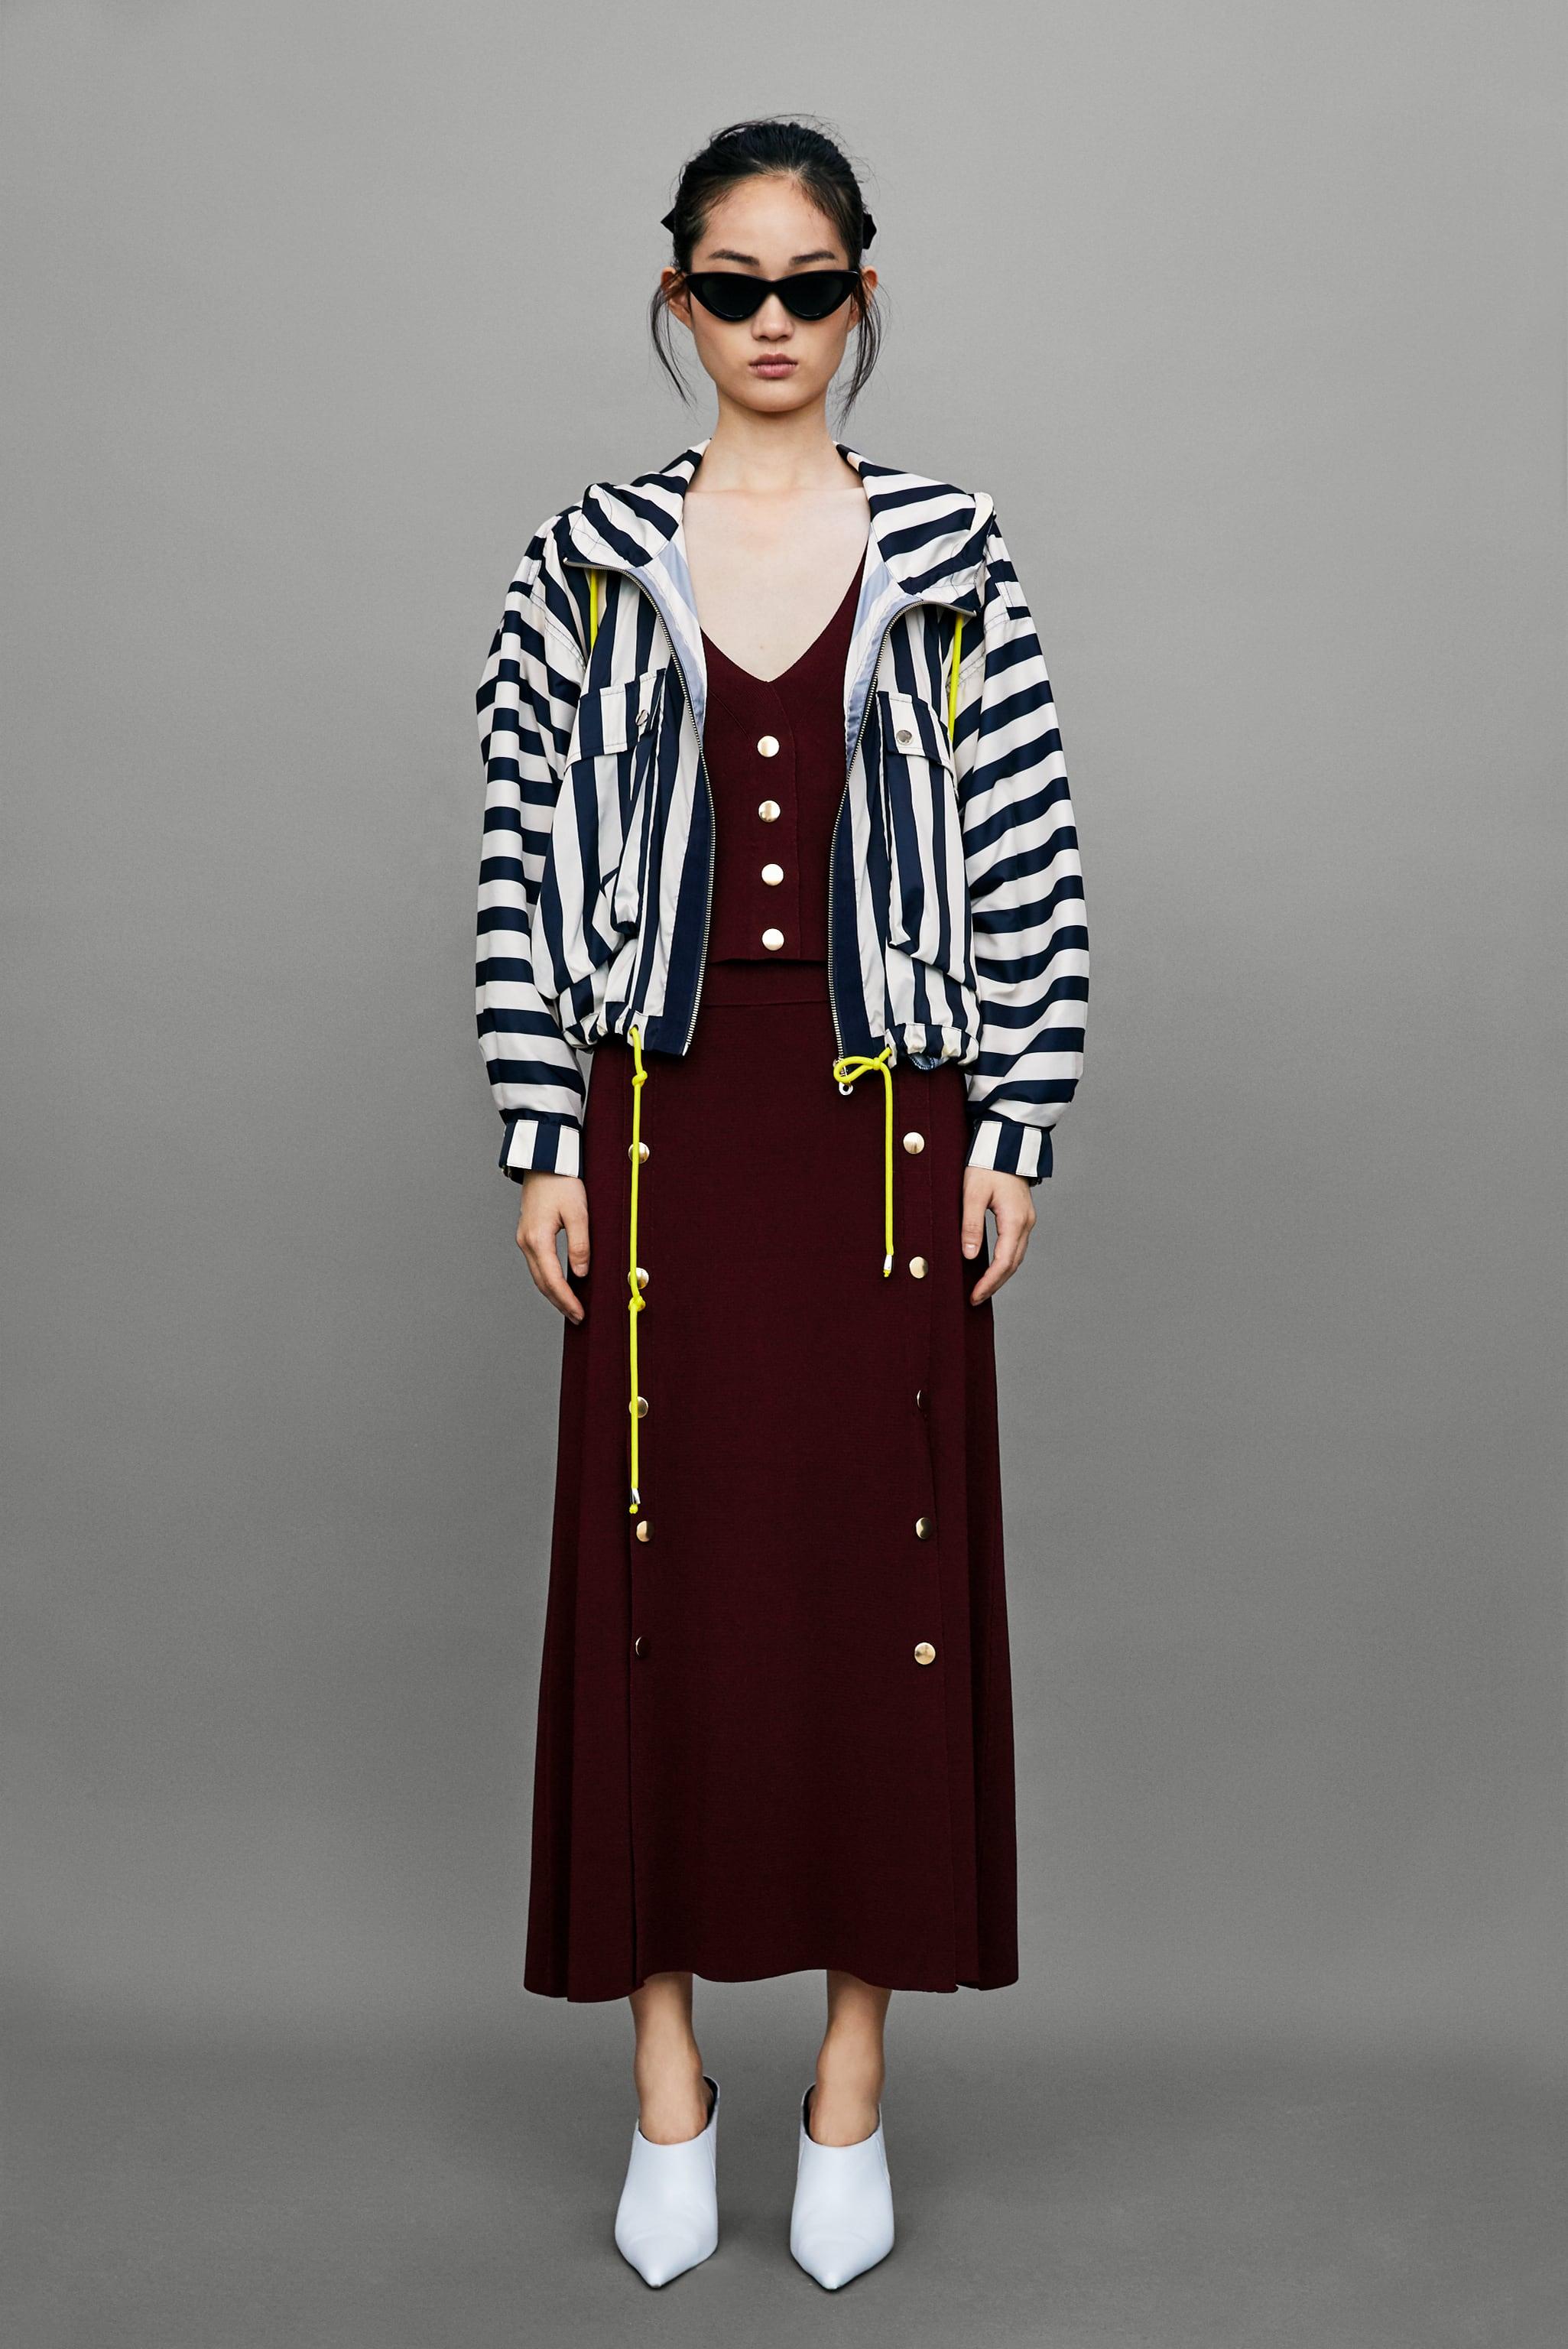 Tony Perotti Casual Aspen Brown Zara Jacket With Contrasting Drawstrings